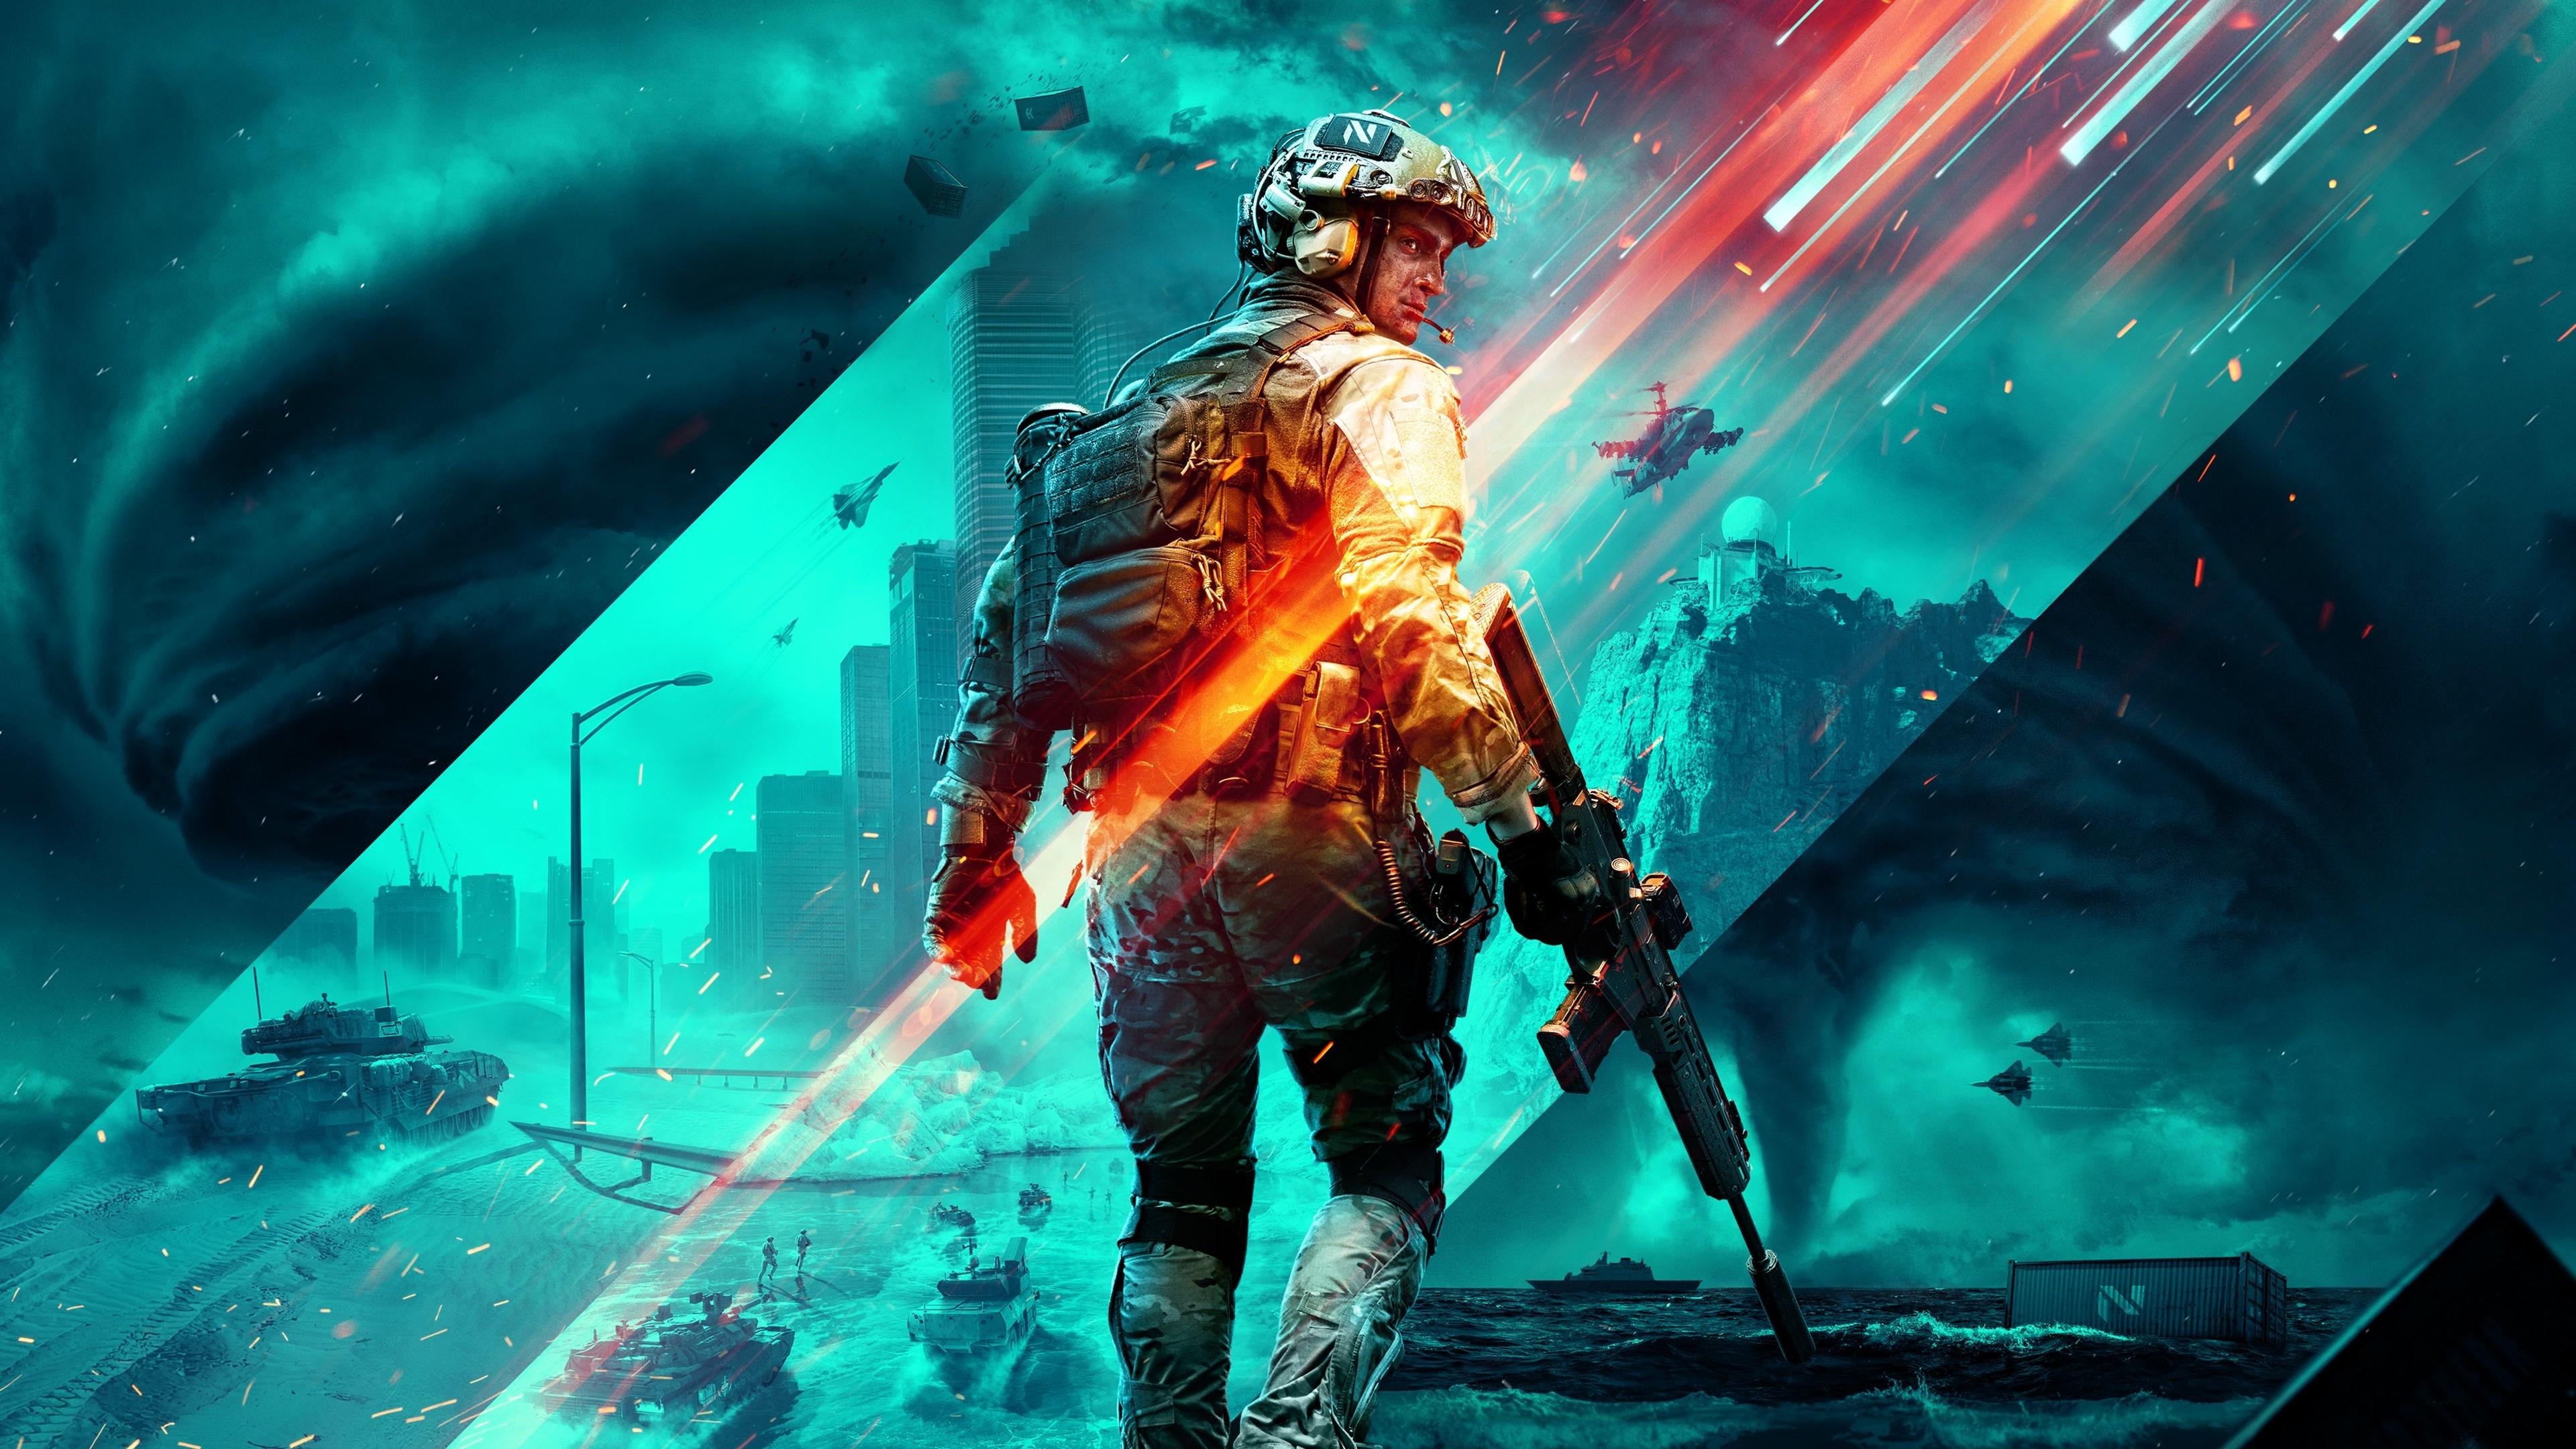 Battlefield 2042 Ultra Hd Wallpaper Wallpaper Hd Games 4k Wallpapers Images Photos And Background Wallpapers Den